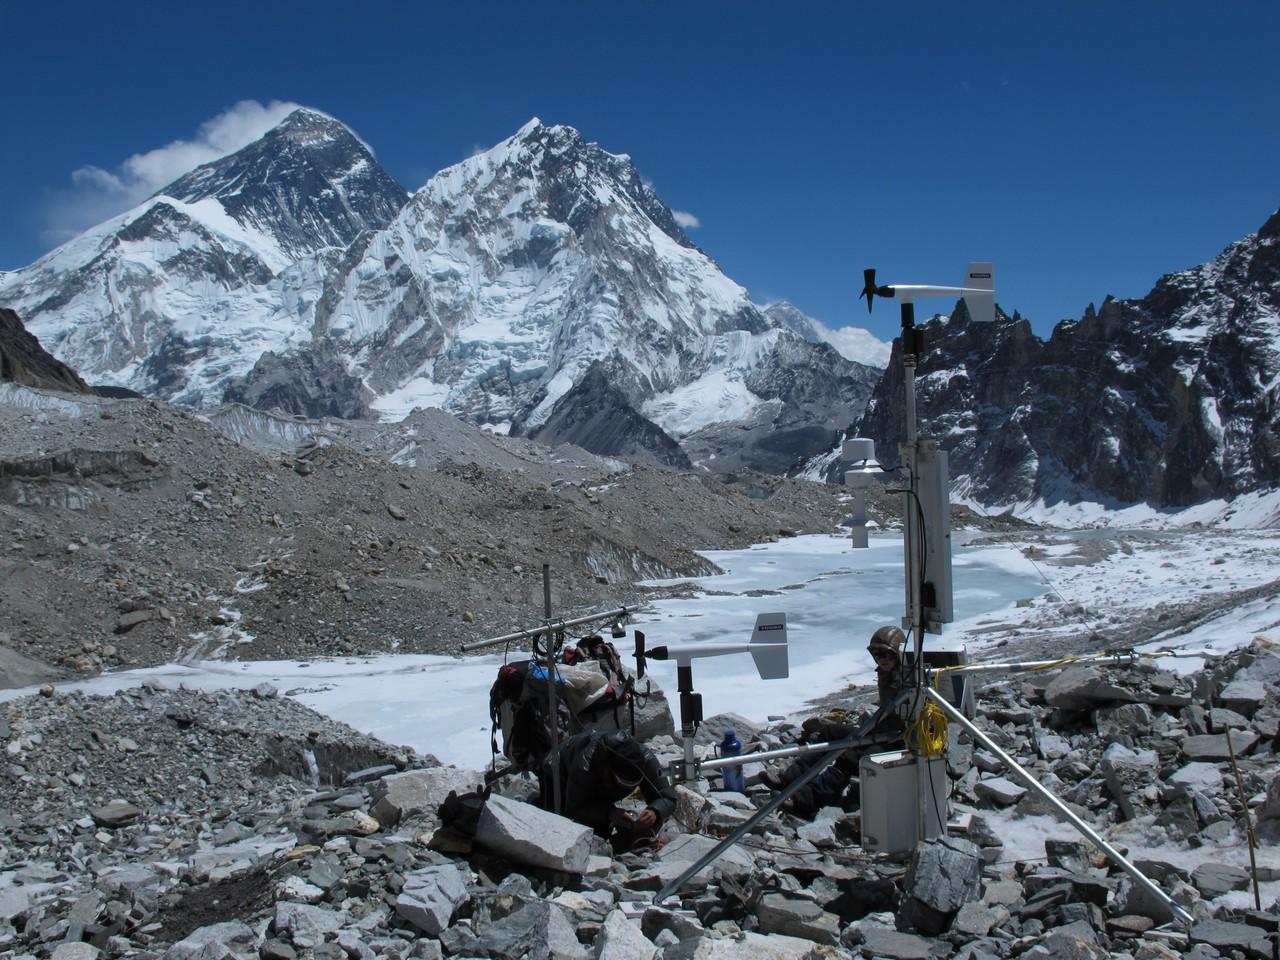 Taking measurements on a glacier in the Dudh Koshi basin (Credit: Patrick Wagnon)